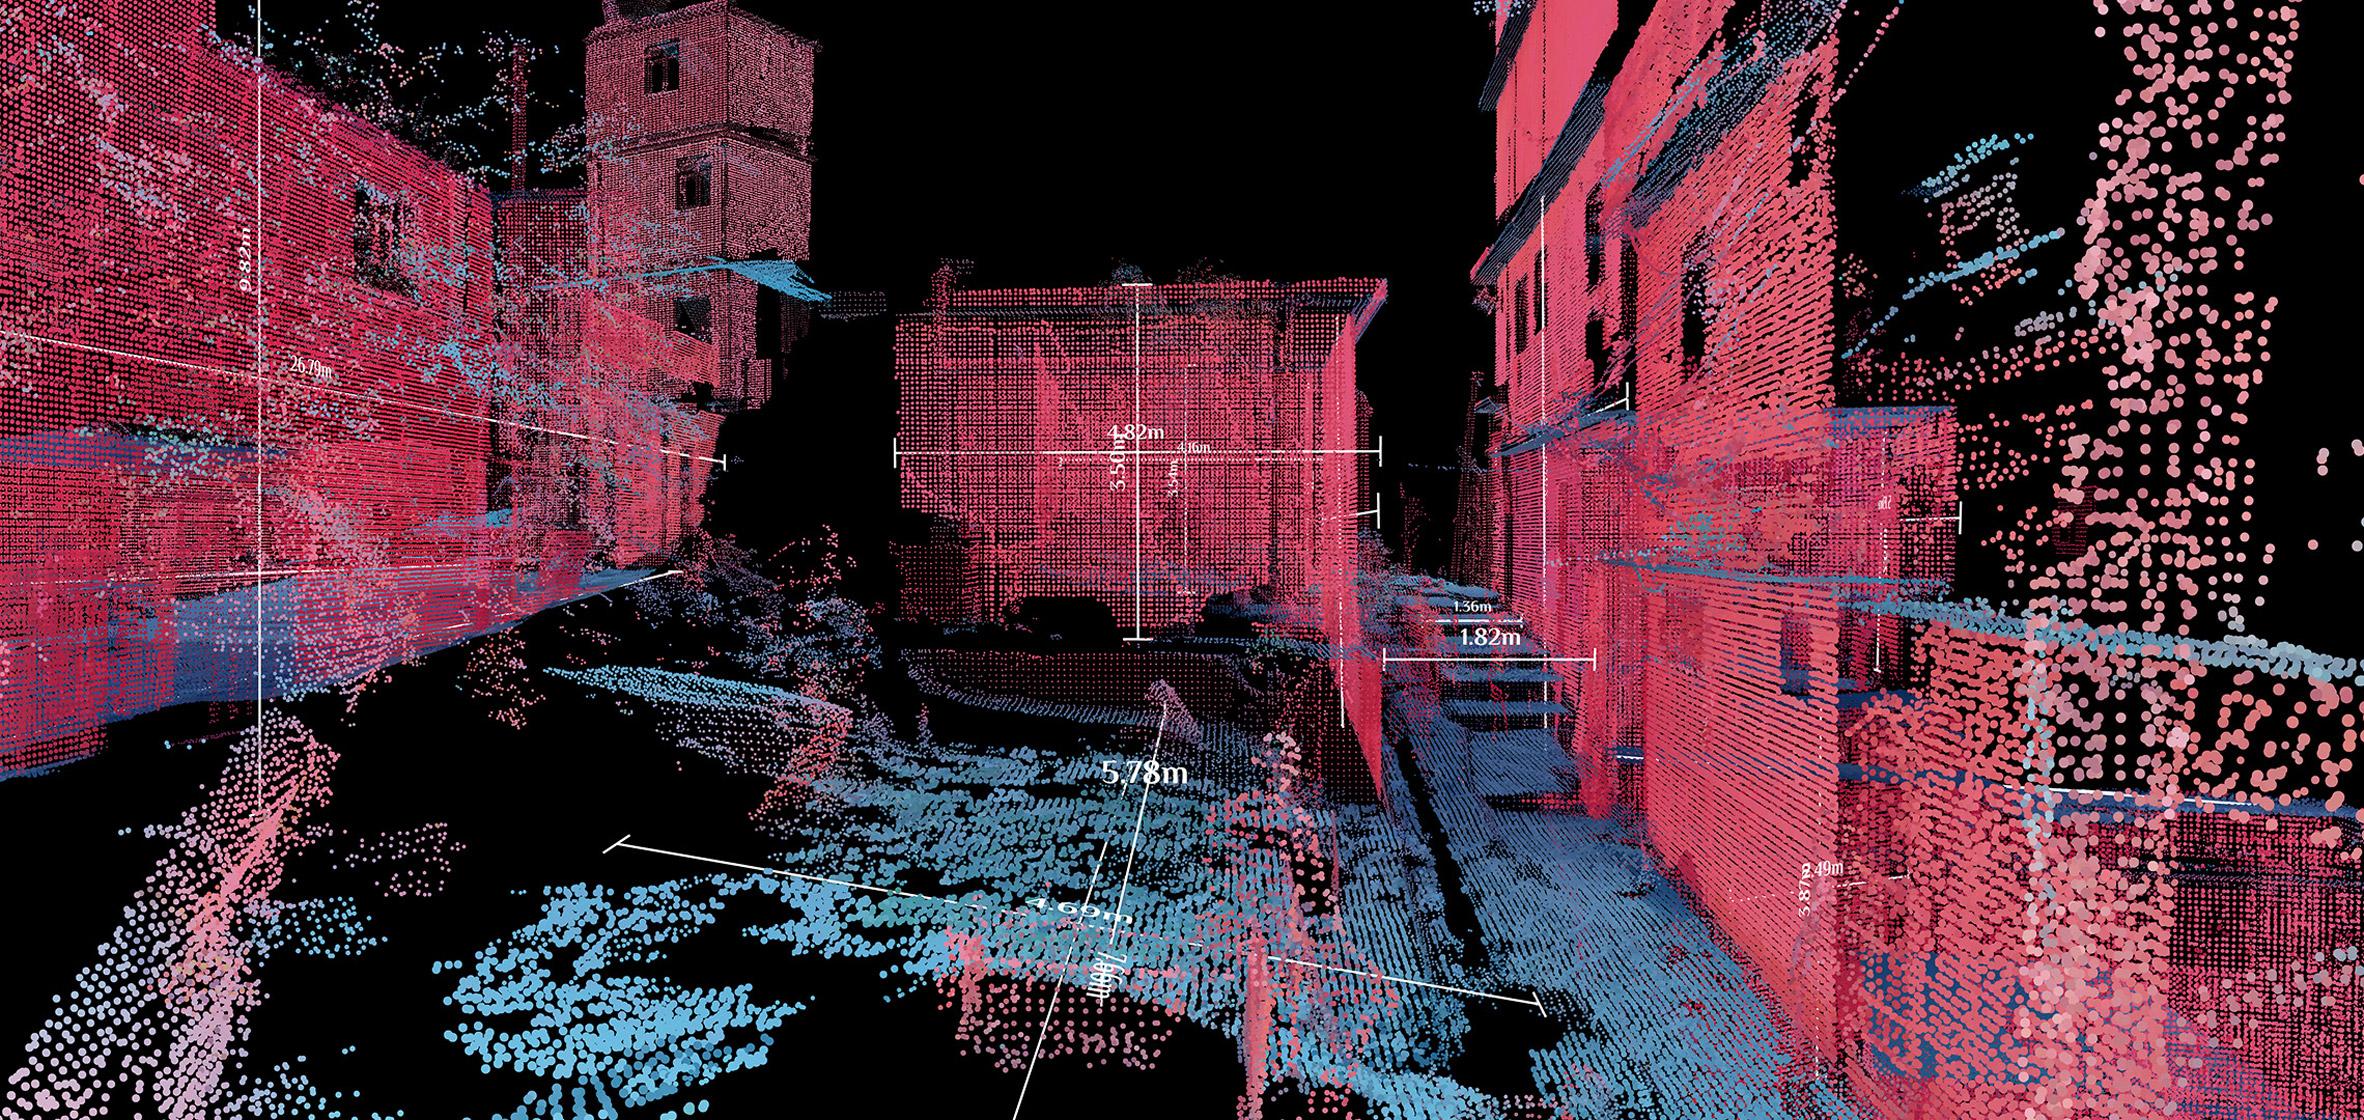 MIT Senseable City Lab undertook the project